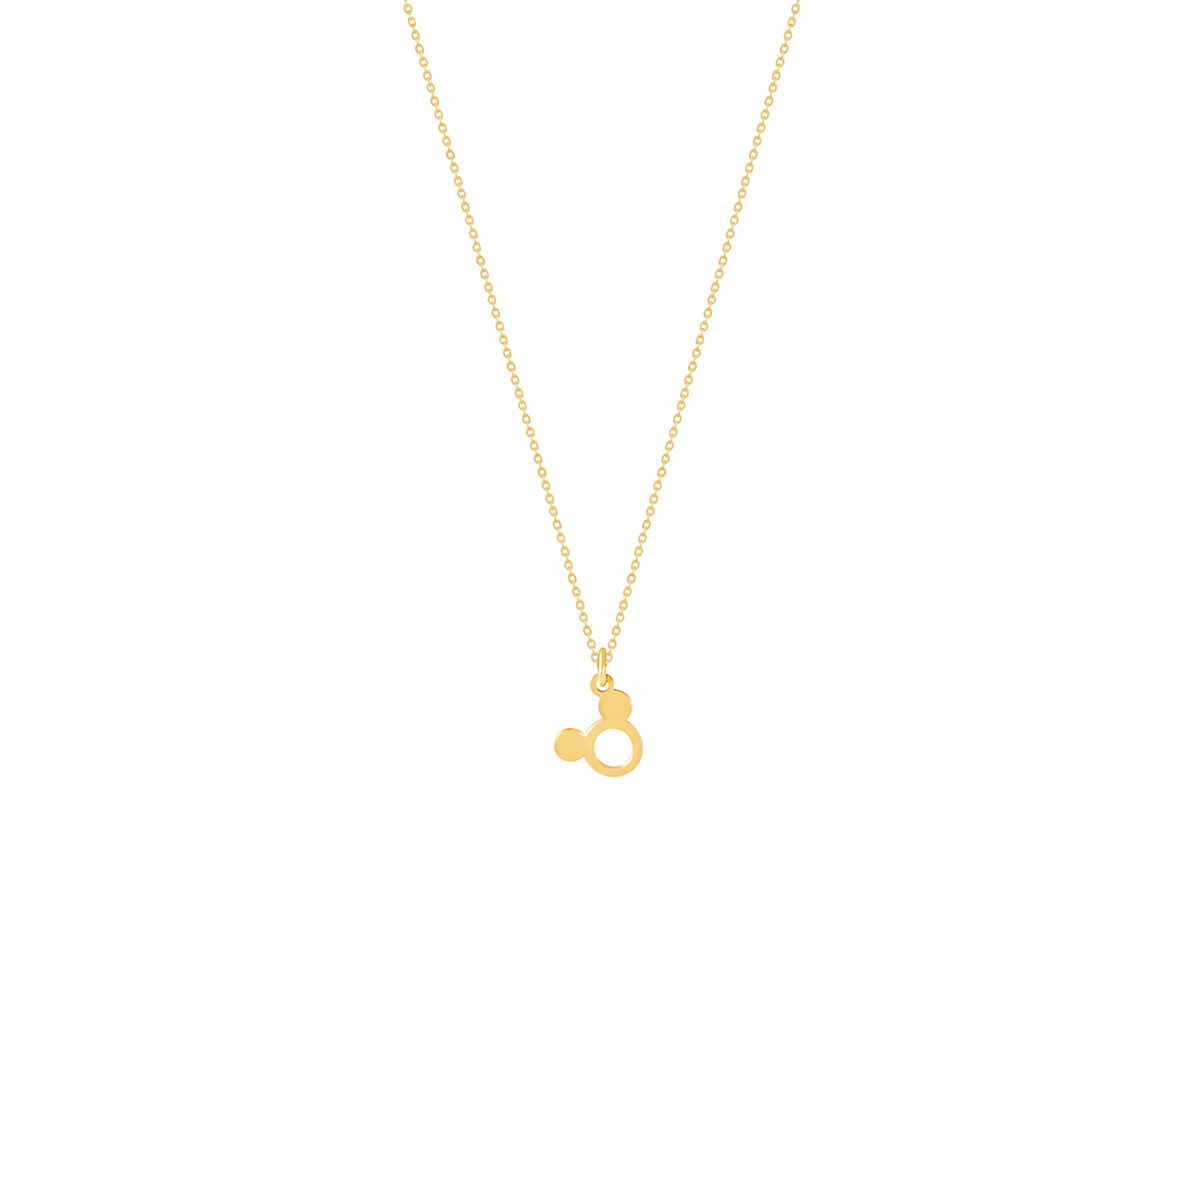 گردنبند طلا Mickey Mouse (توخالی) پرسته